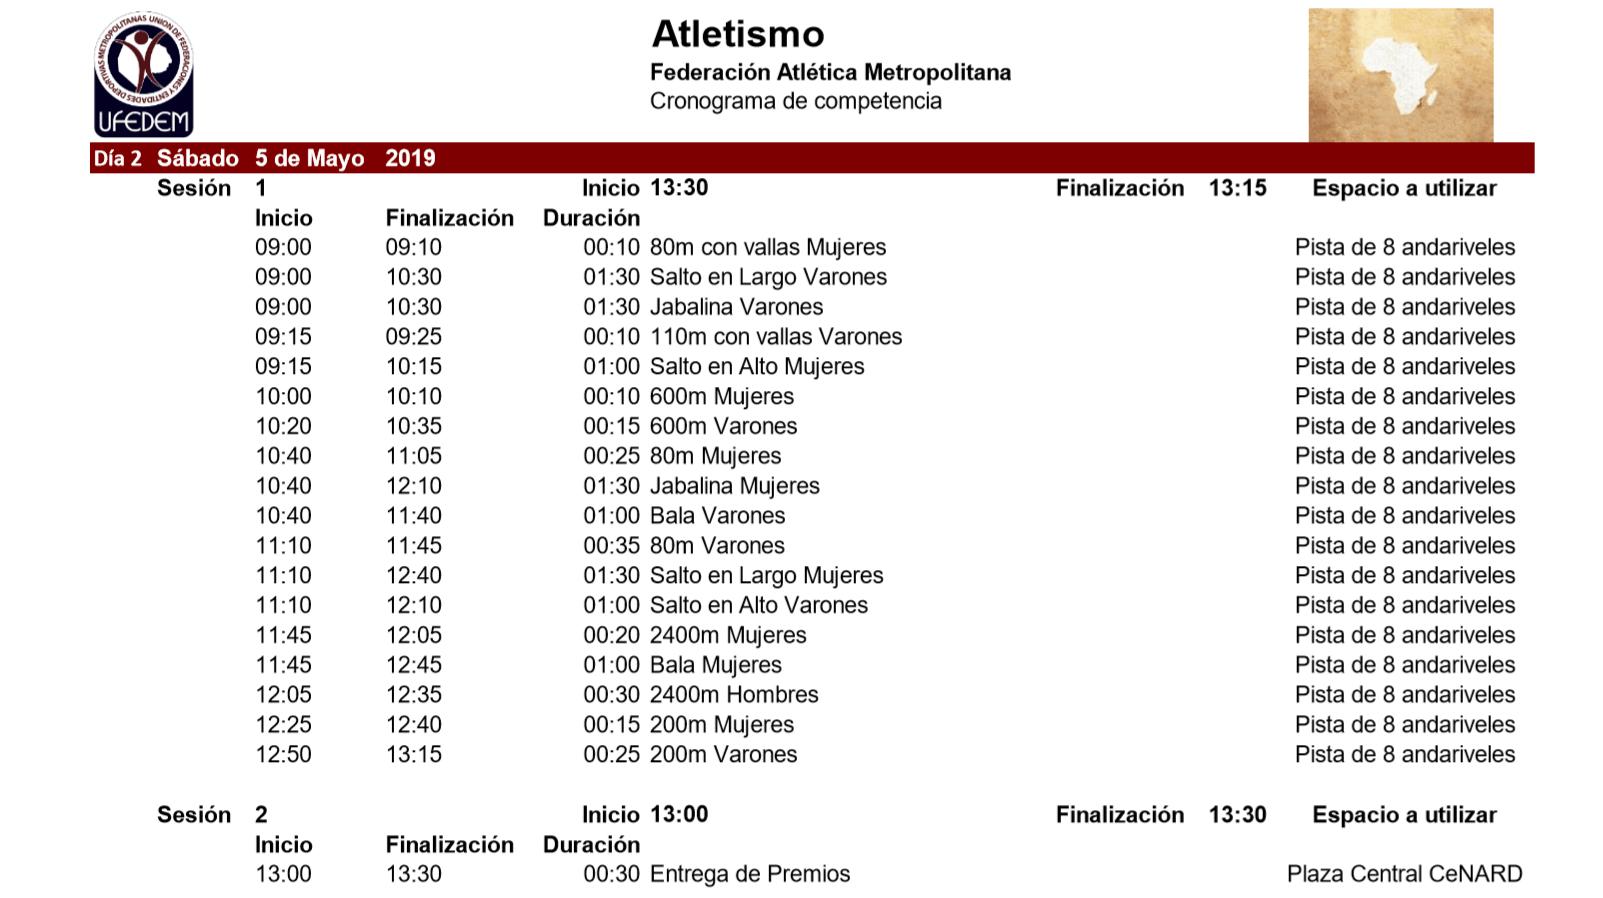 Atletismo 2.2 - Cronograma